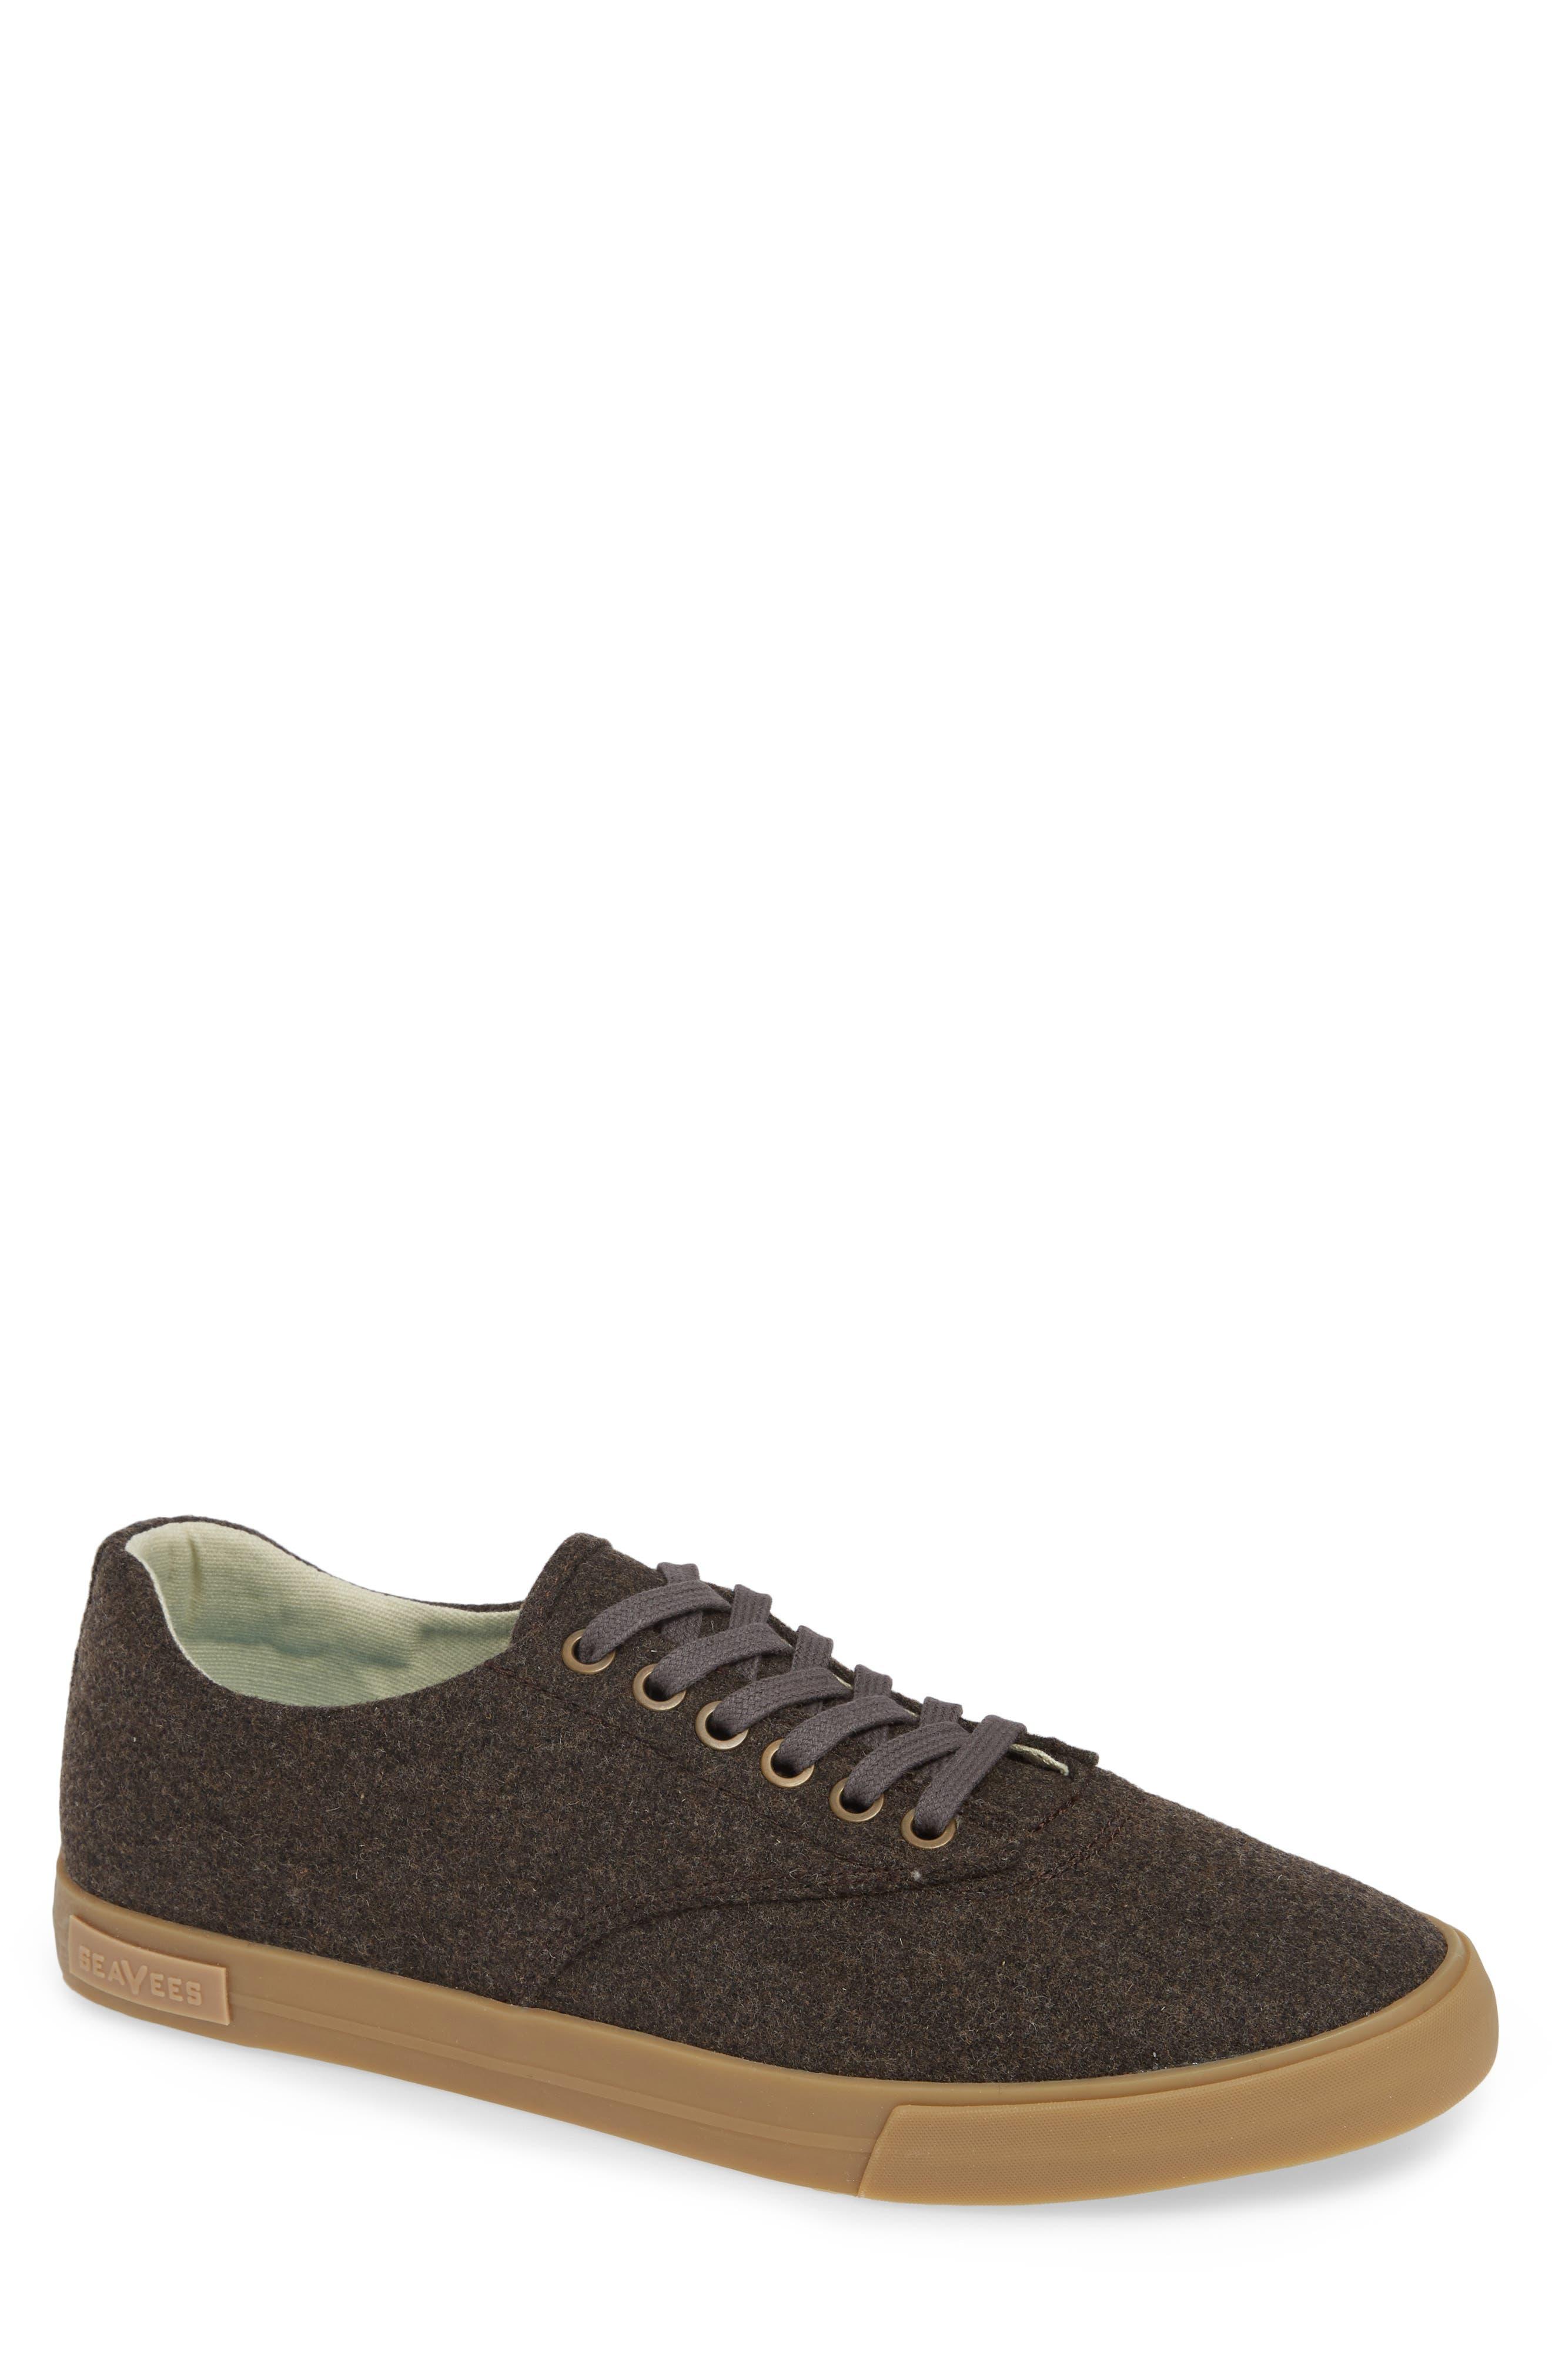 Hermosa Grayers Sneaker,                             Main thumbnail 1, color,                             DARK BROWN WOOL FLANNEL